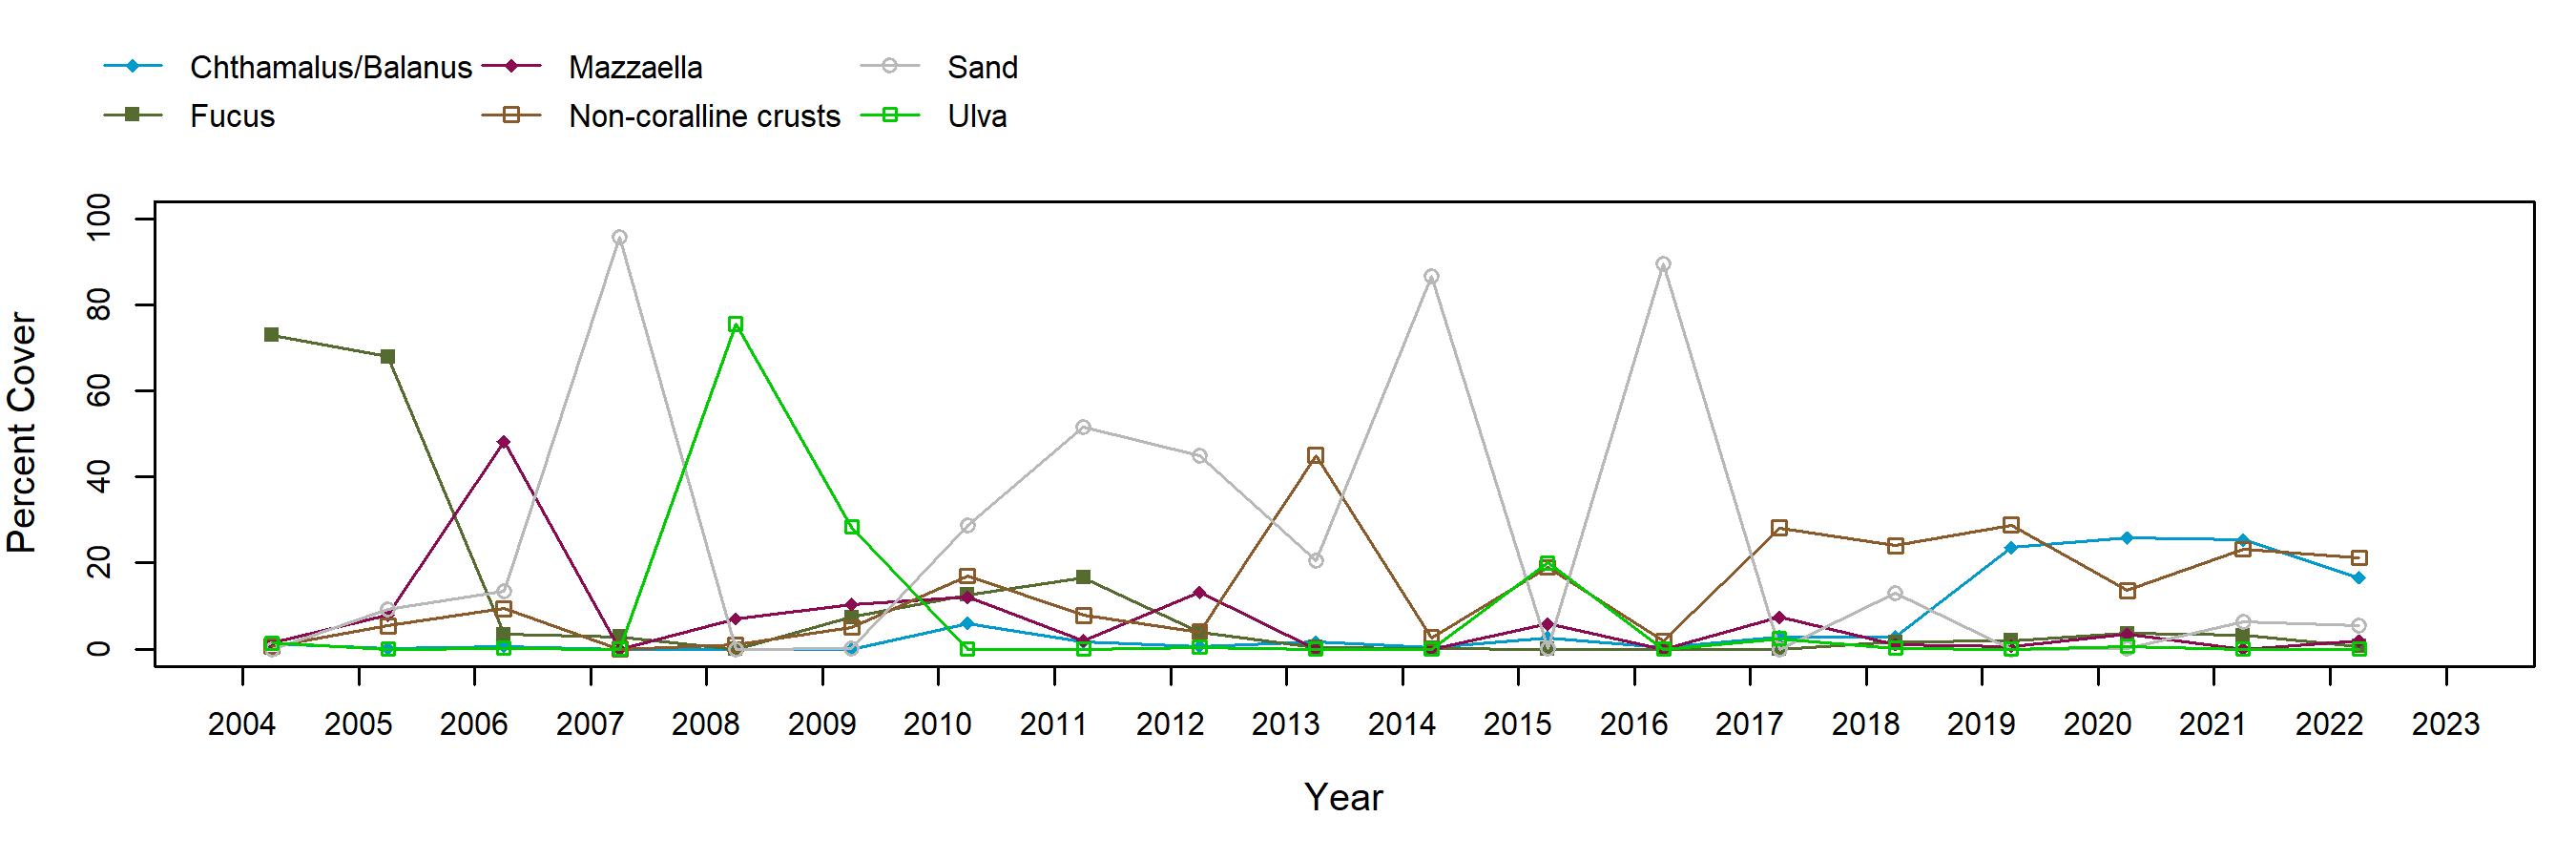 Sea Ranch Fucus trend plot